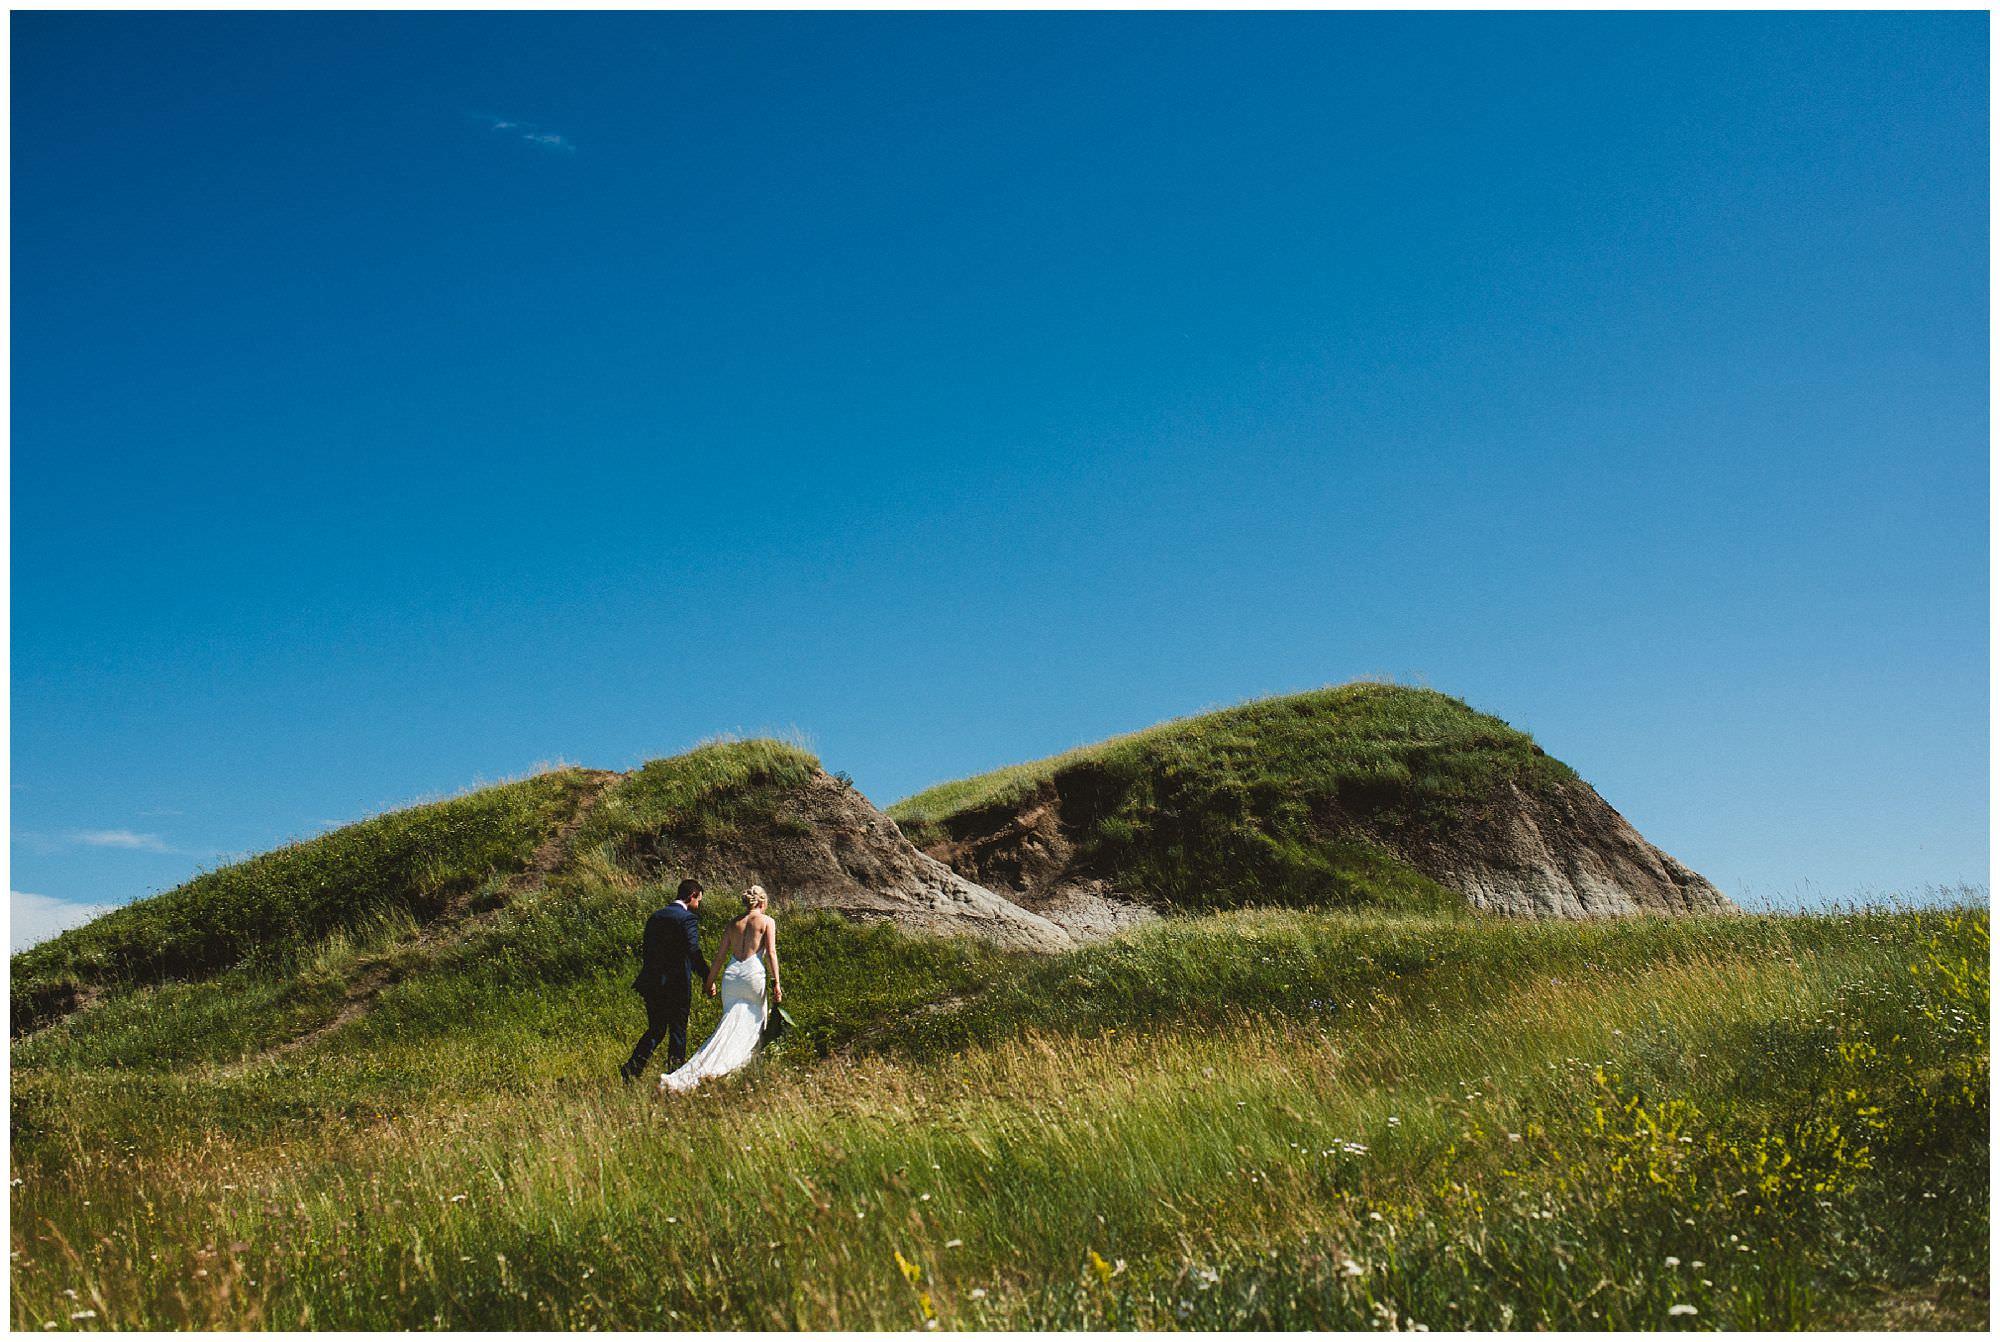 Bride and groom walk through epic scenery at Kleskun Hills in Grande Prairie Alberta, destination wedding photographer